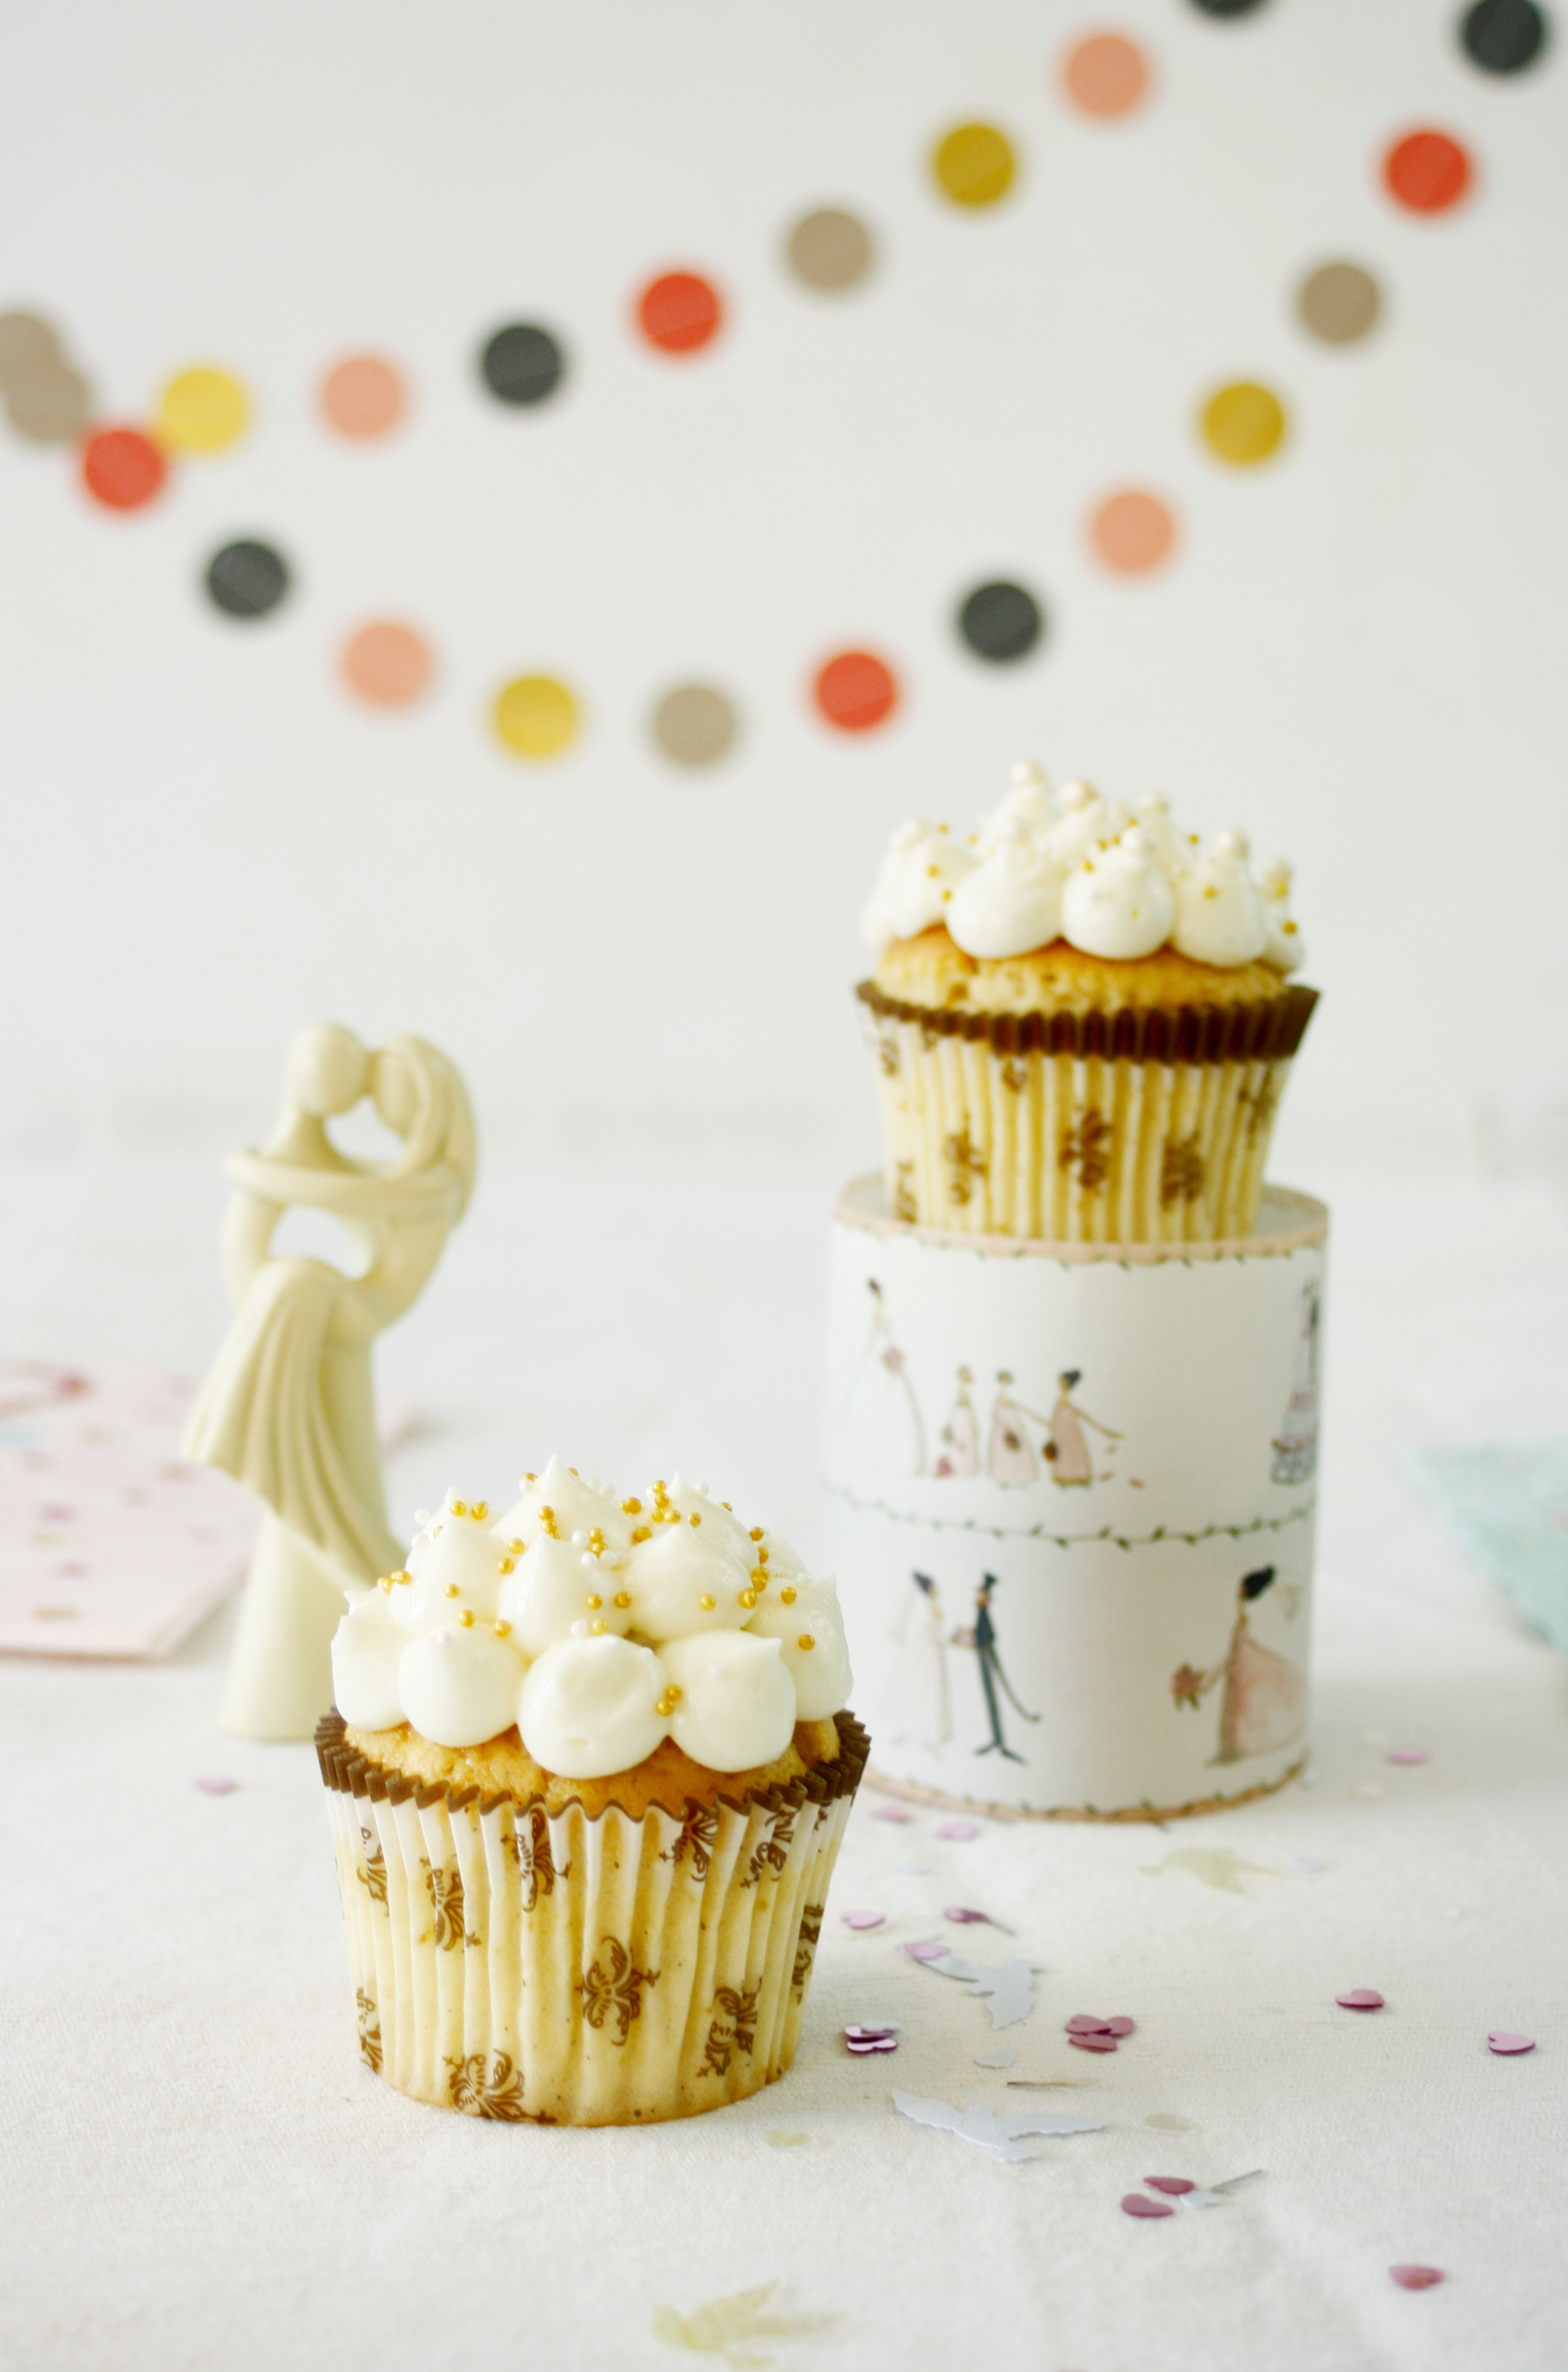 Sweet Table mit Kokos Cupcakes // Cupcakes with coconut by http://babyrockmyday.com/kokos-cupcakes/0